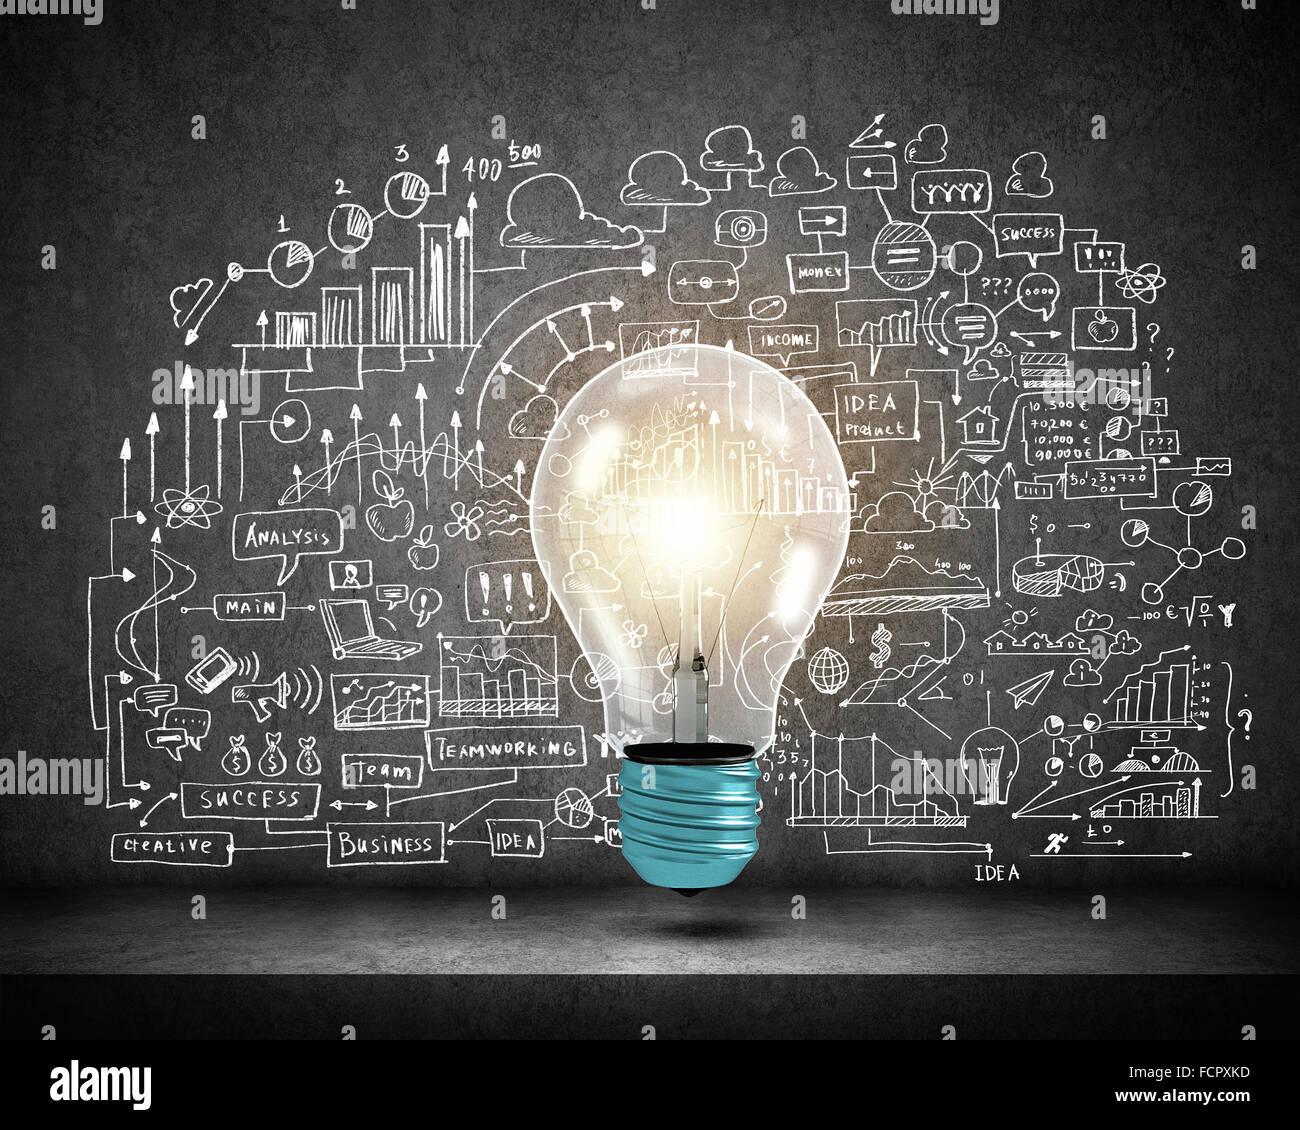 Konzeptbild Glühbirne an Wand mit Ideenskizzen Stockbild